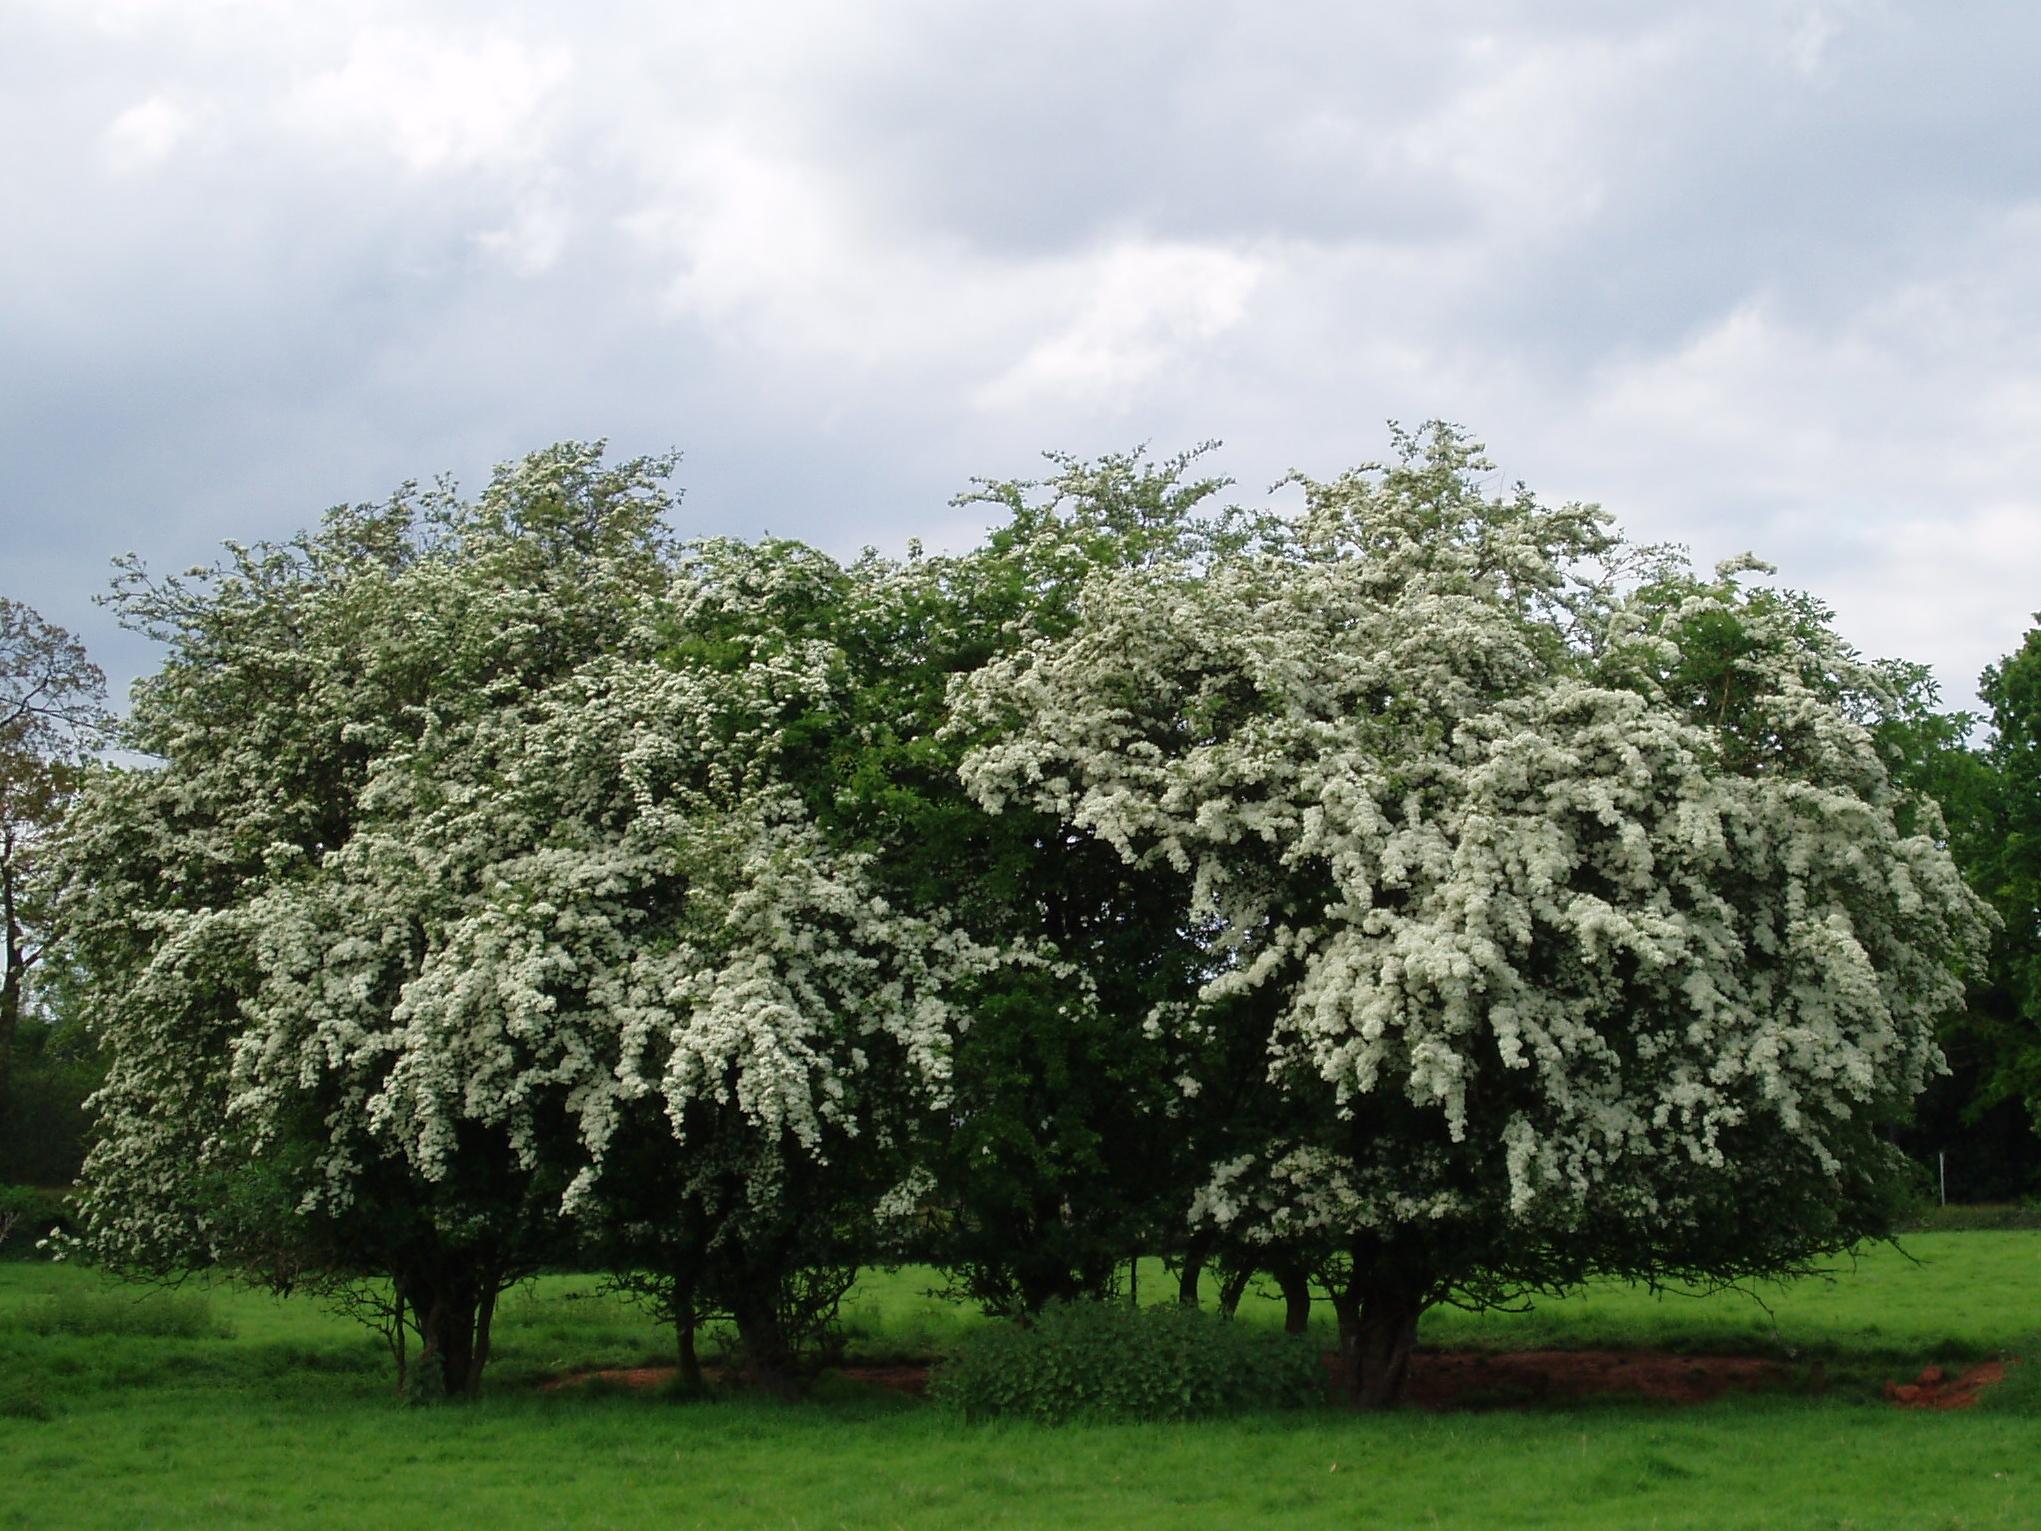 Hawthorn (Crataegus sp.) blossom, Pikers Lane, somewhere in the Allesley Village and Parish, United Kingdom. (c) Amanda Slater